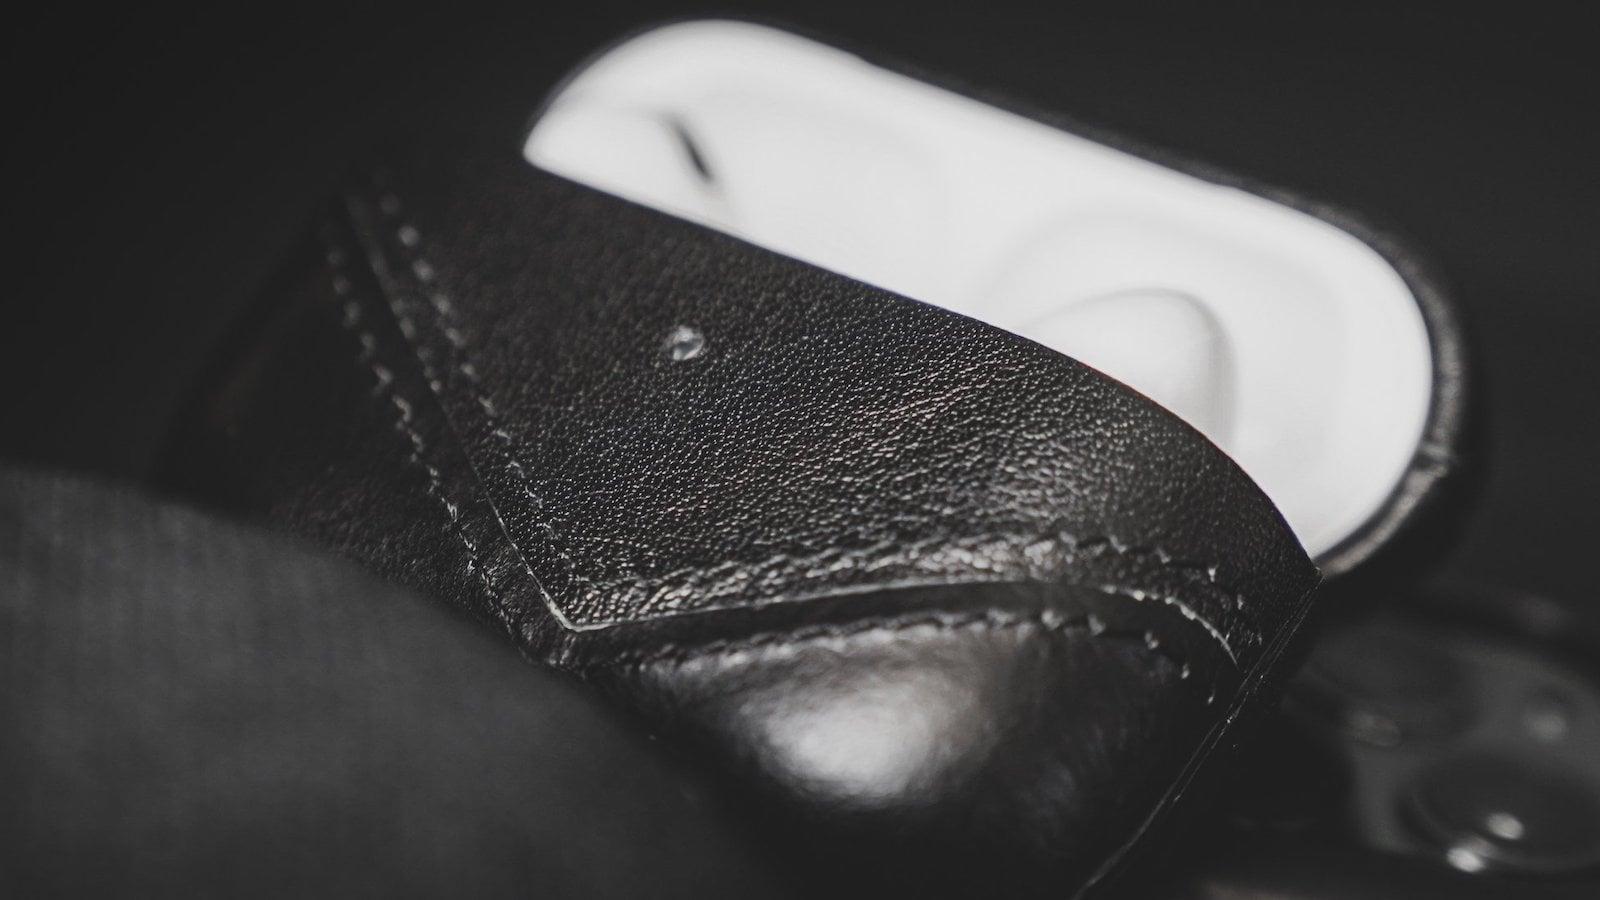 Bullstrap-Leather-AirPods-Case-01.jpeg